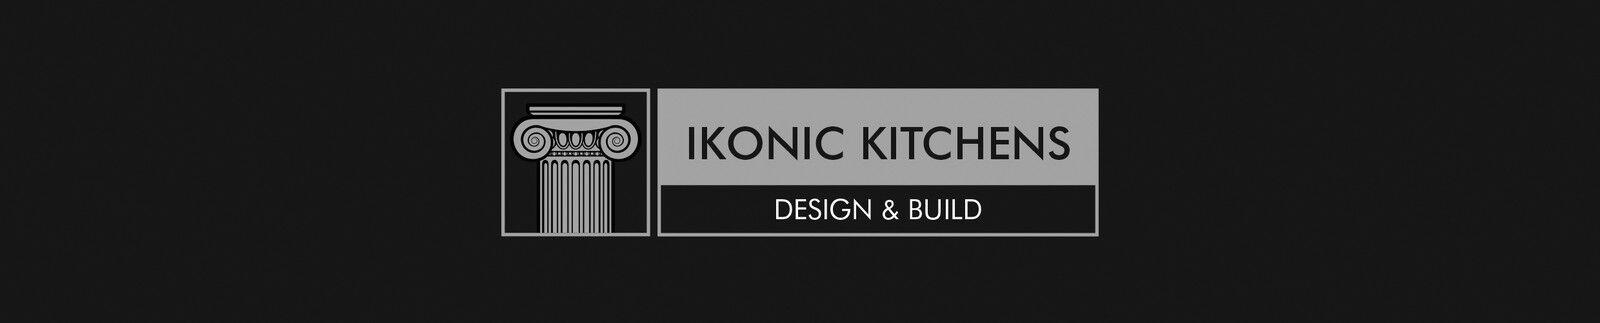 Ikonic Kitchens